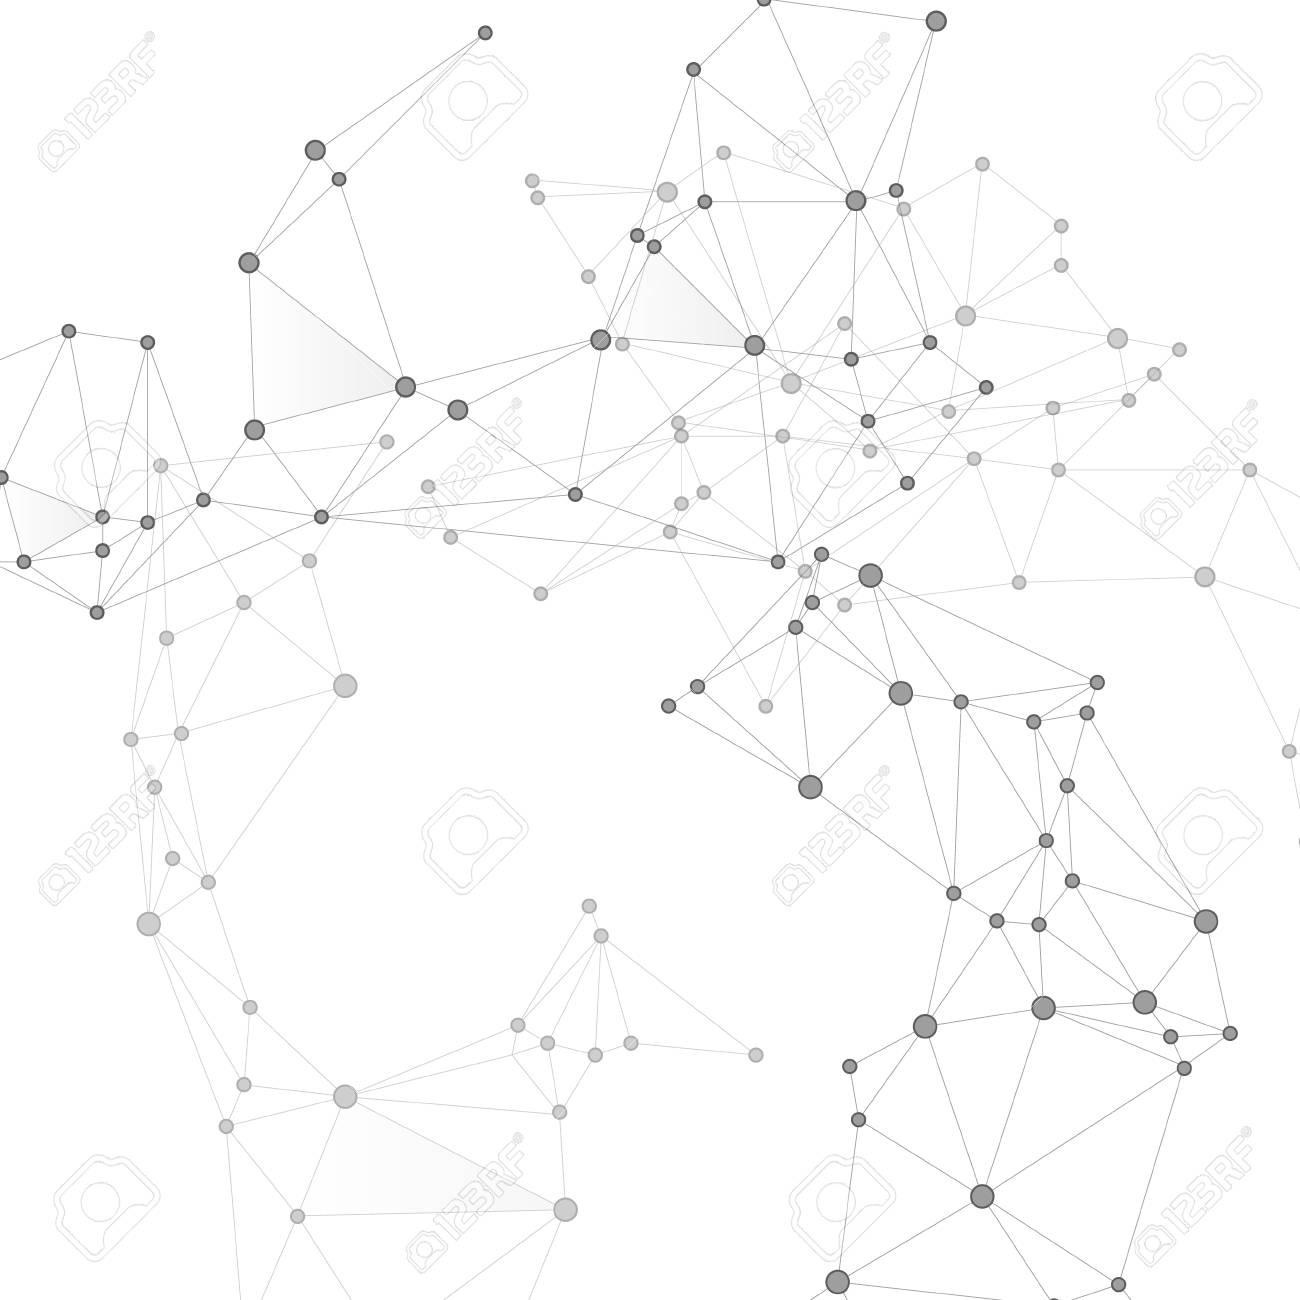 Block chain global network technology concept. Network nodes greyscale plexus background. Net grid of node points, lines matrix. Global data exchange blockchain vector. Information analytics graphics. - 121314485